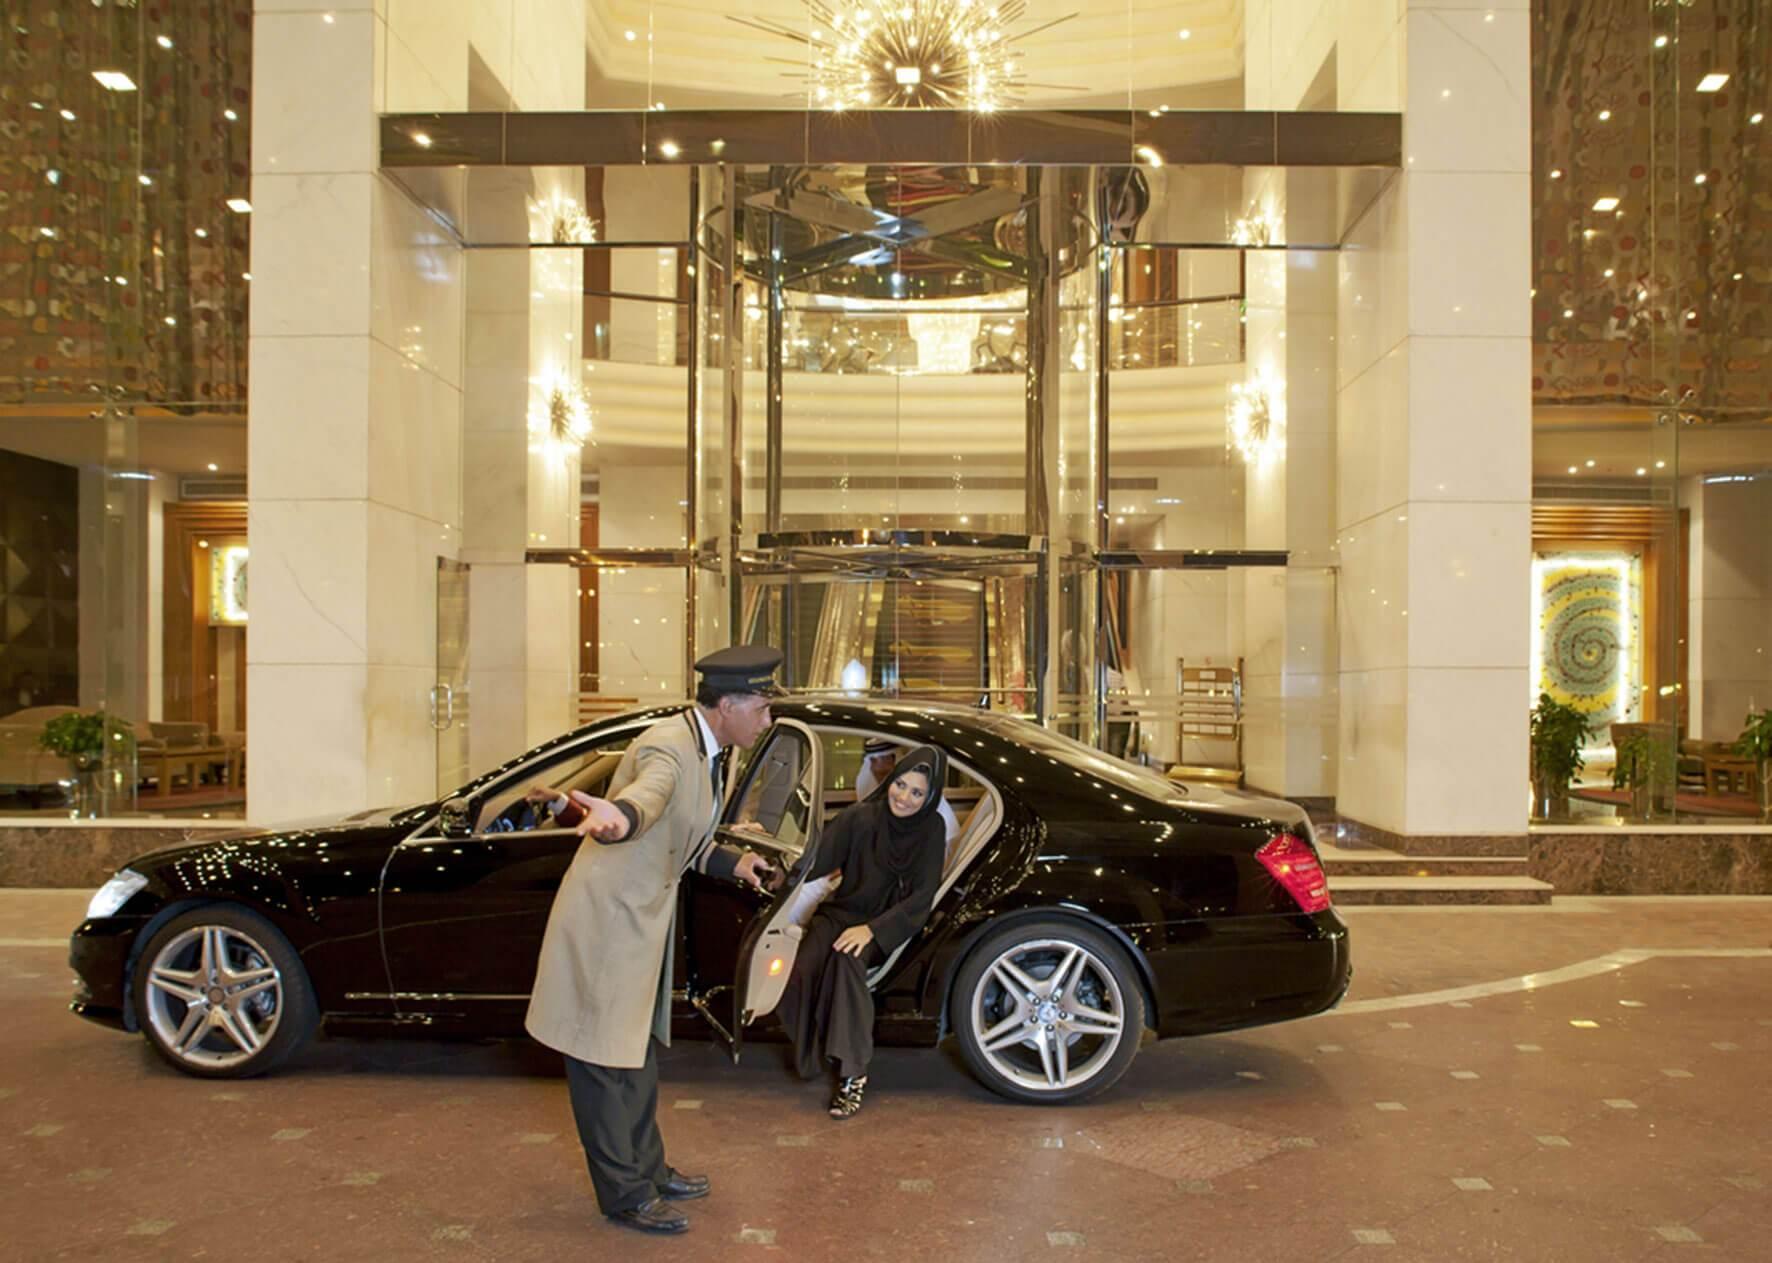 The Gulf Hotel Bahrain Luxury 5 Star Accomodation In Kingdom Of